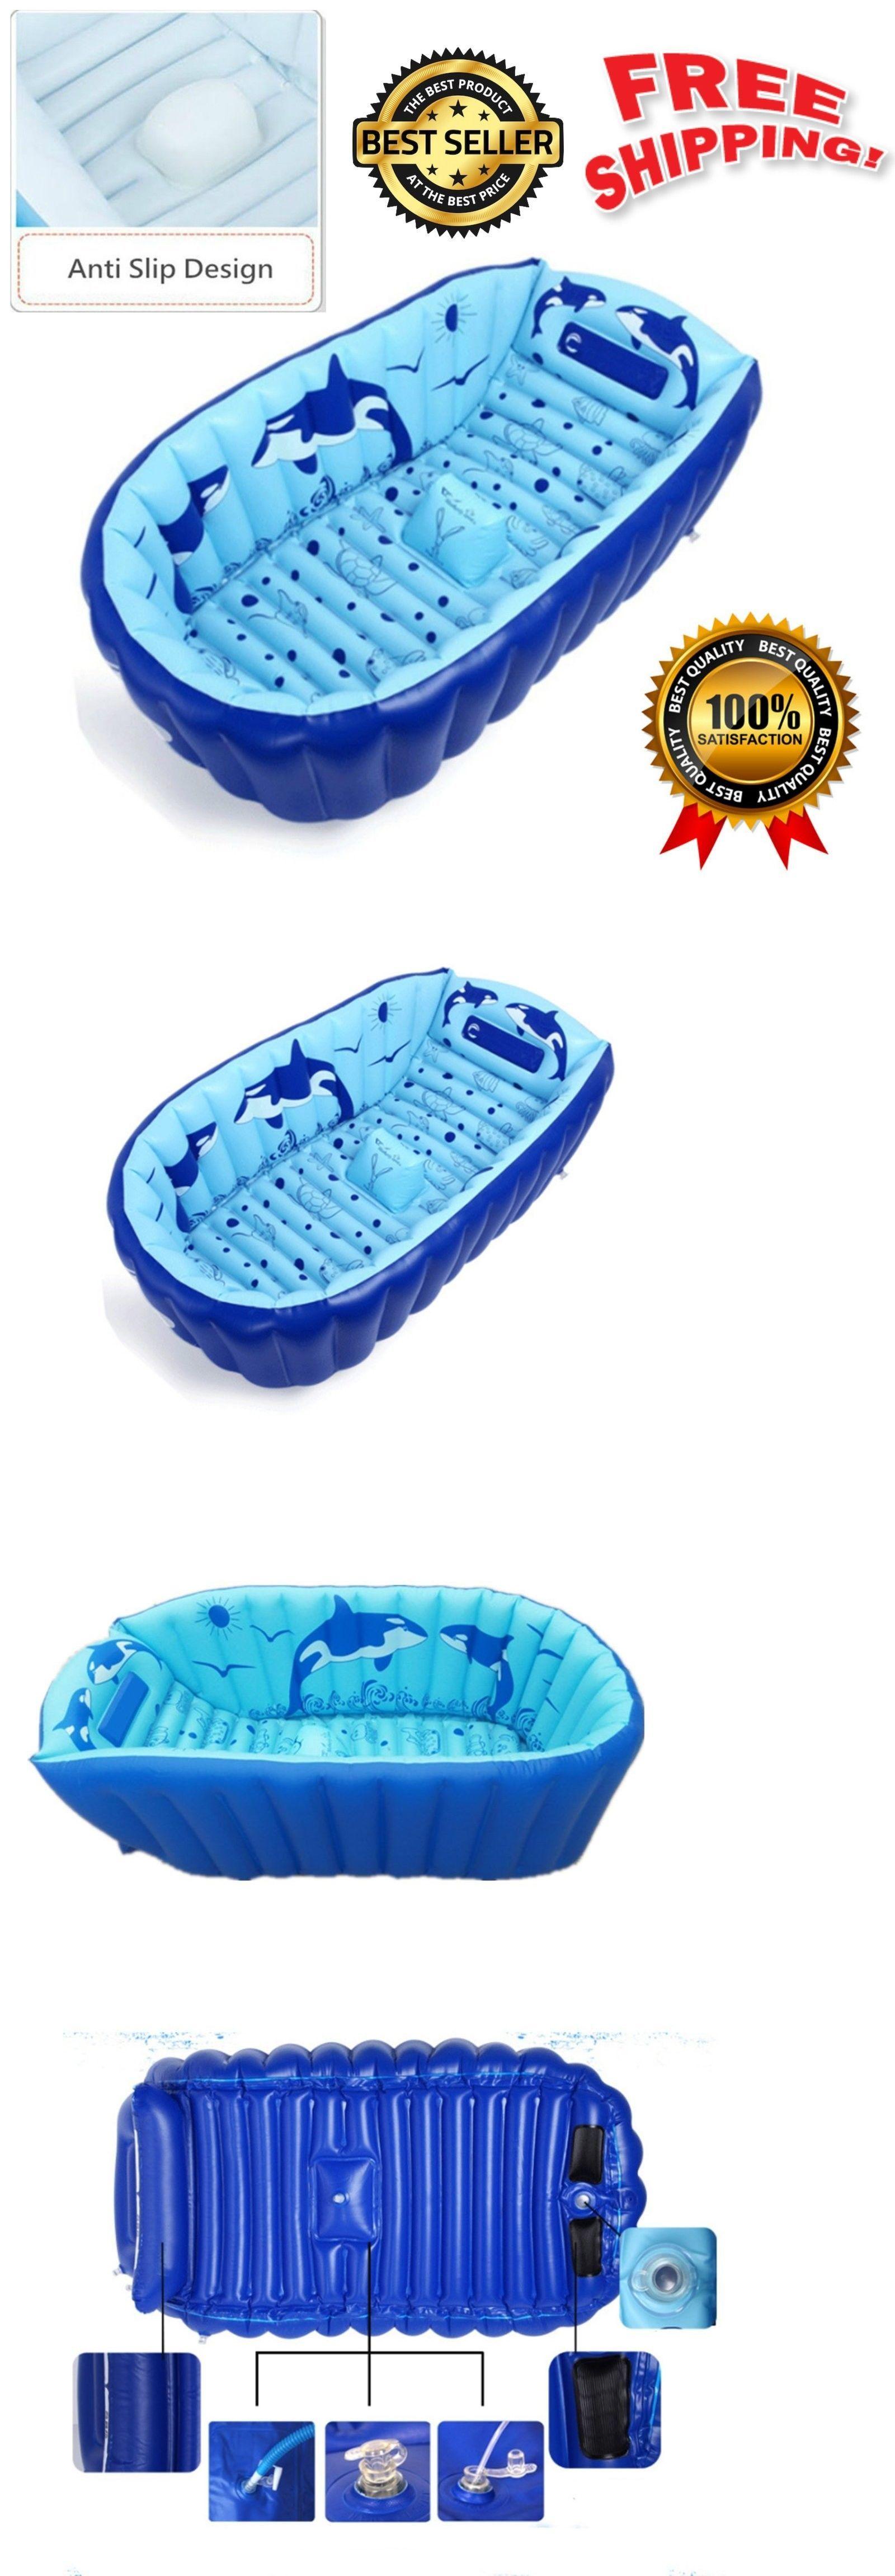 Bath Tubs 113814: Inflatable Baby Bathtub Portable Mini Air Swimming ...